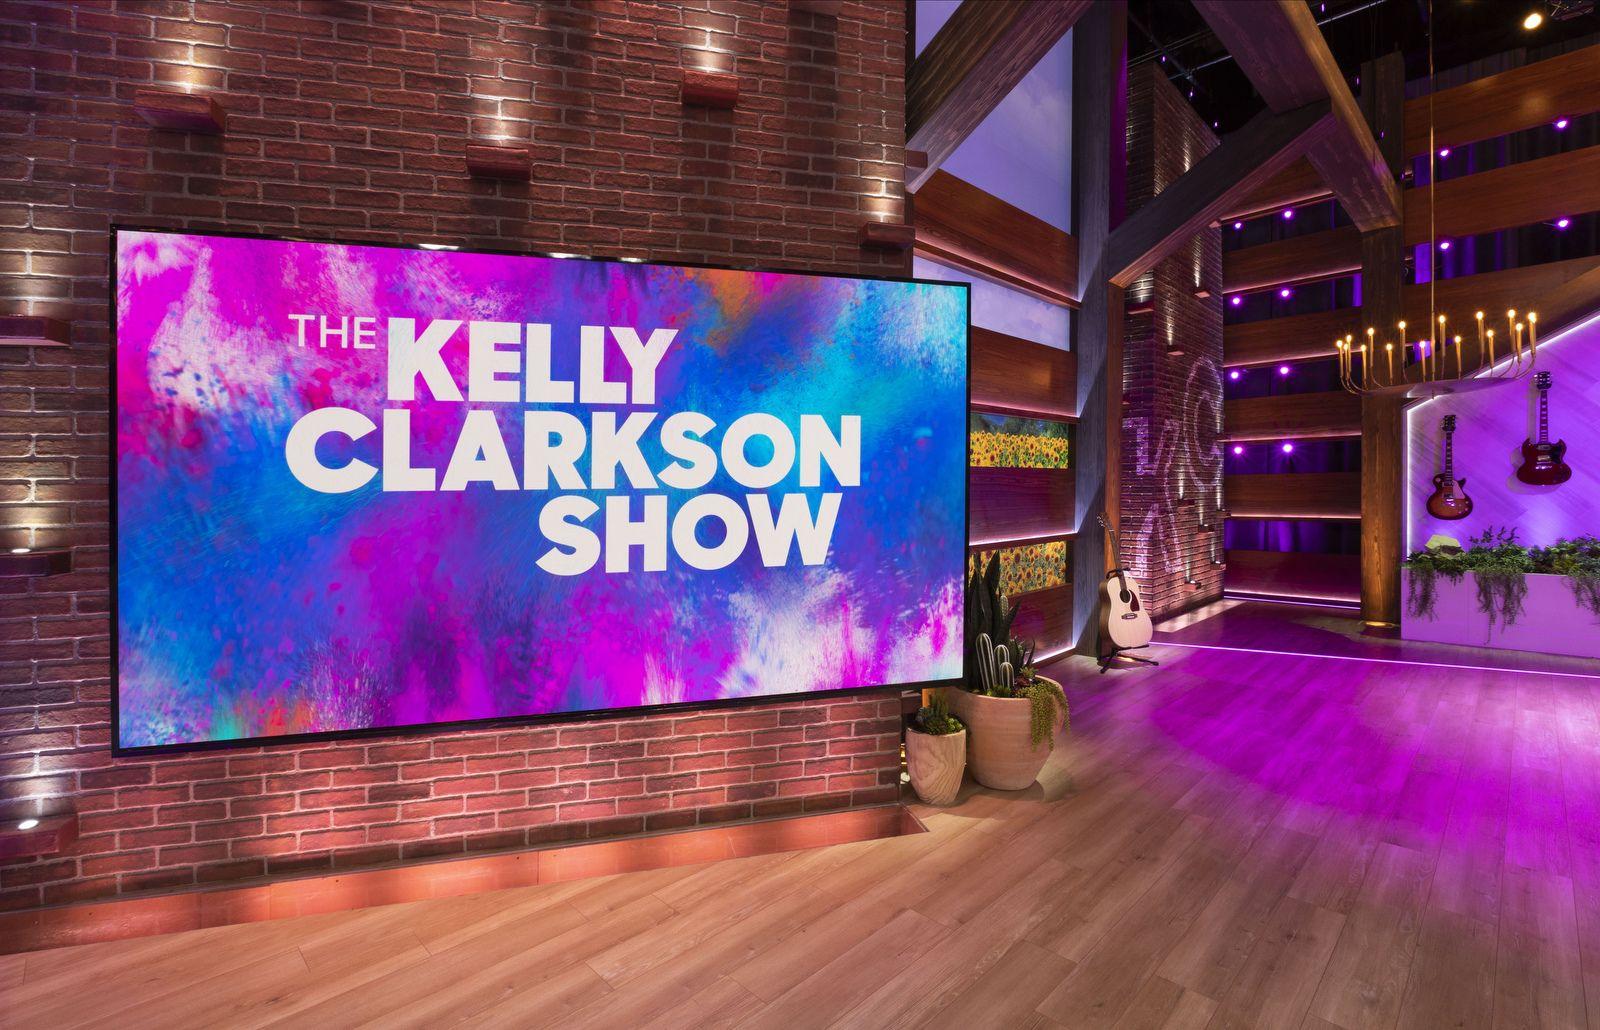 d7f6189730c32f9bf6233e57bc1d90cd - How Do I Get Tickets To The Kelly Clarkson Show